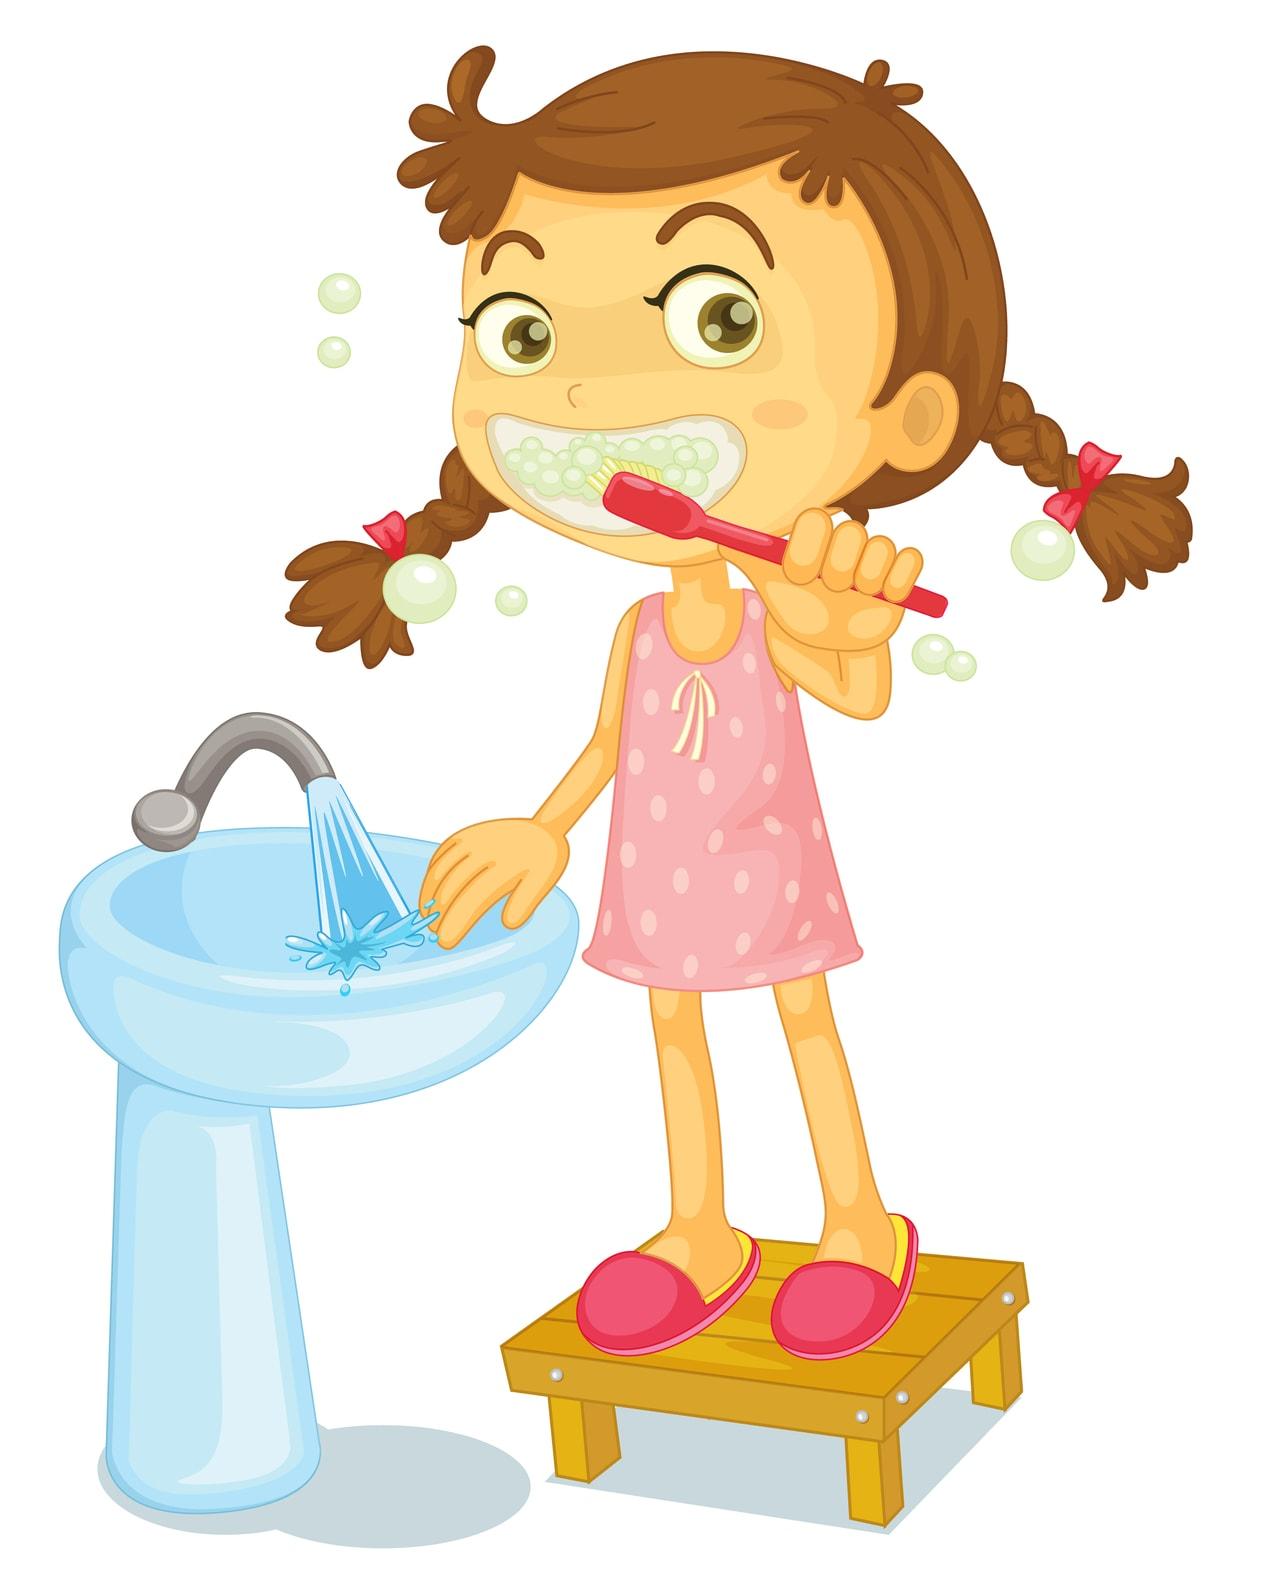 Kid Brush Teeth,CartoonBrush Teeth,Teeth Brush(第11页)_点力图库